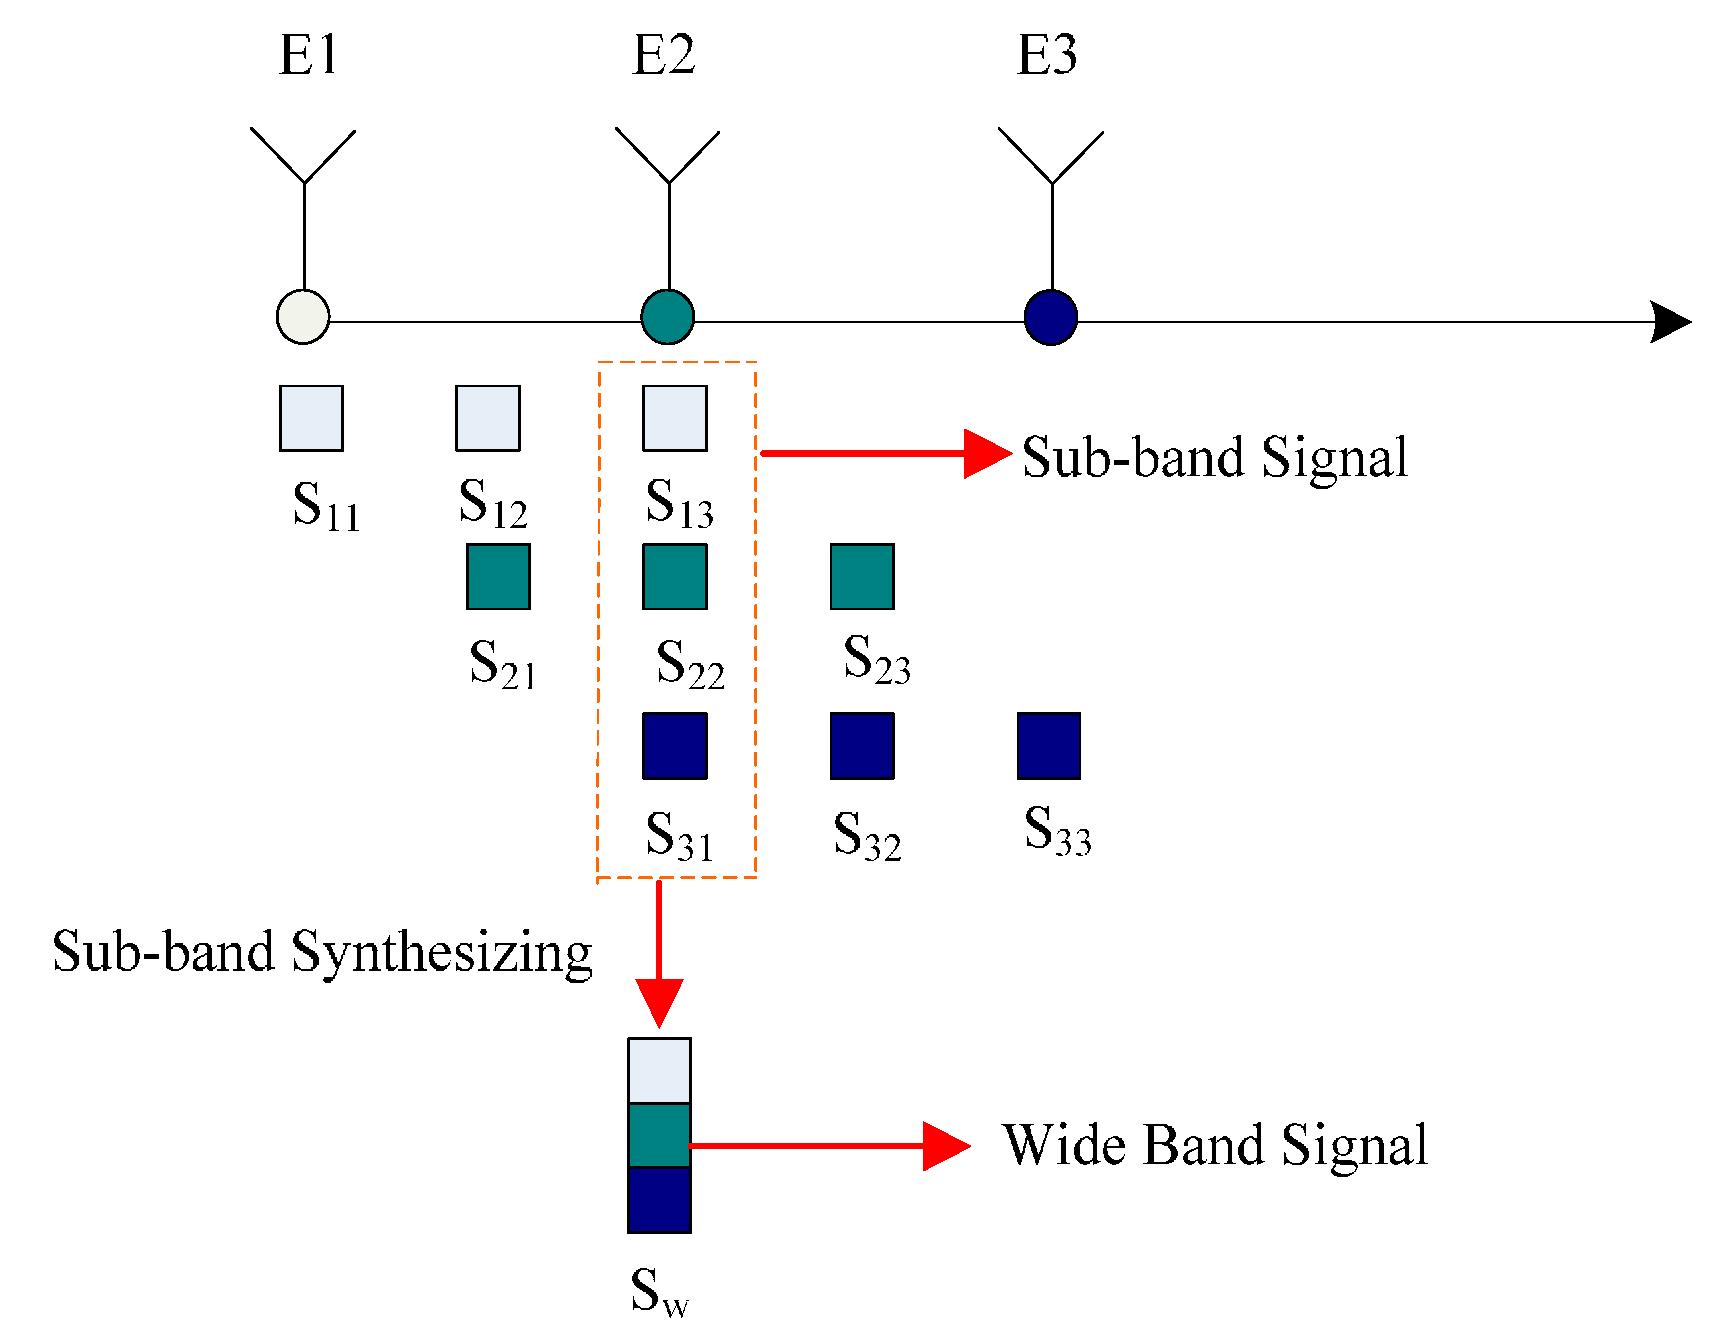 Signal jamming model d - signal jamming methods of teaching